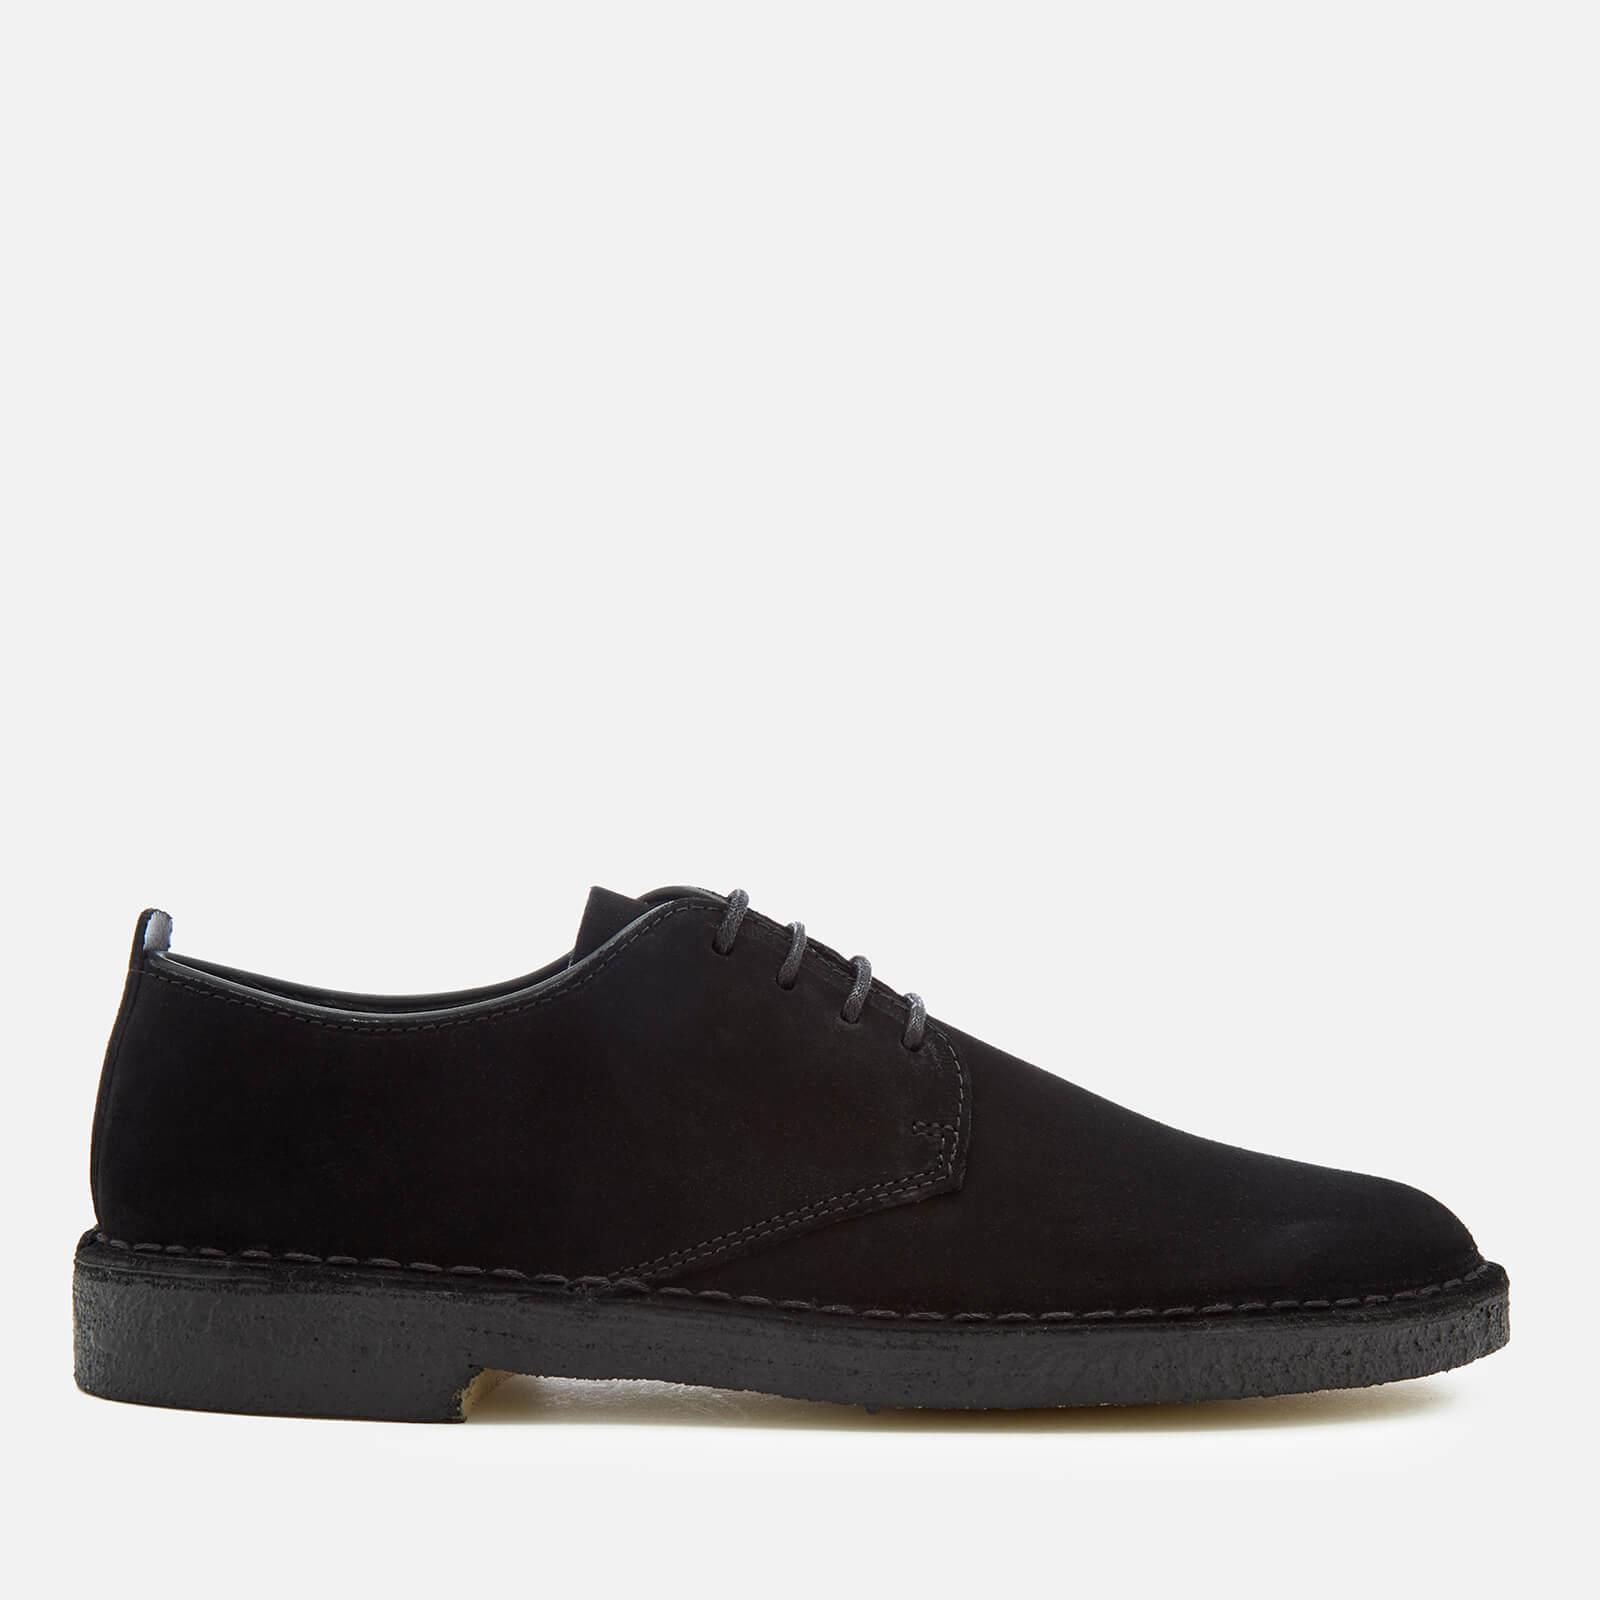 Clarks Originals Men's Desert London Shoes - Black - UK 8 - Black